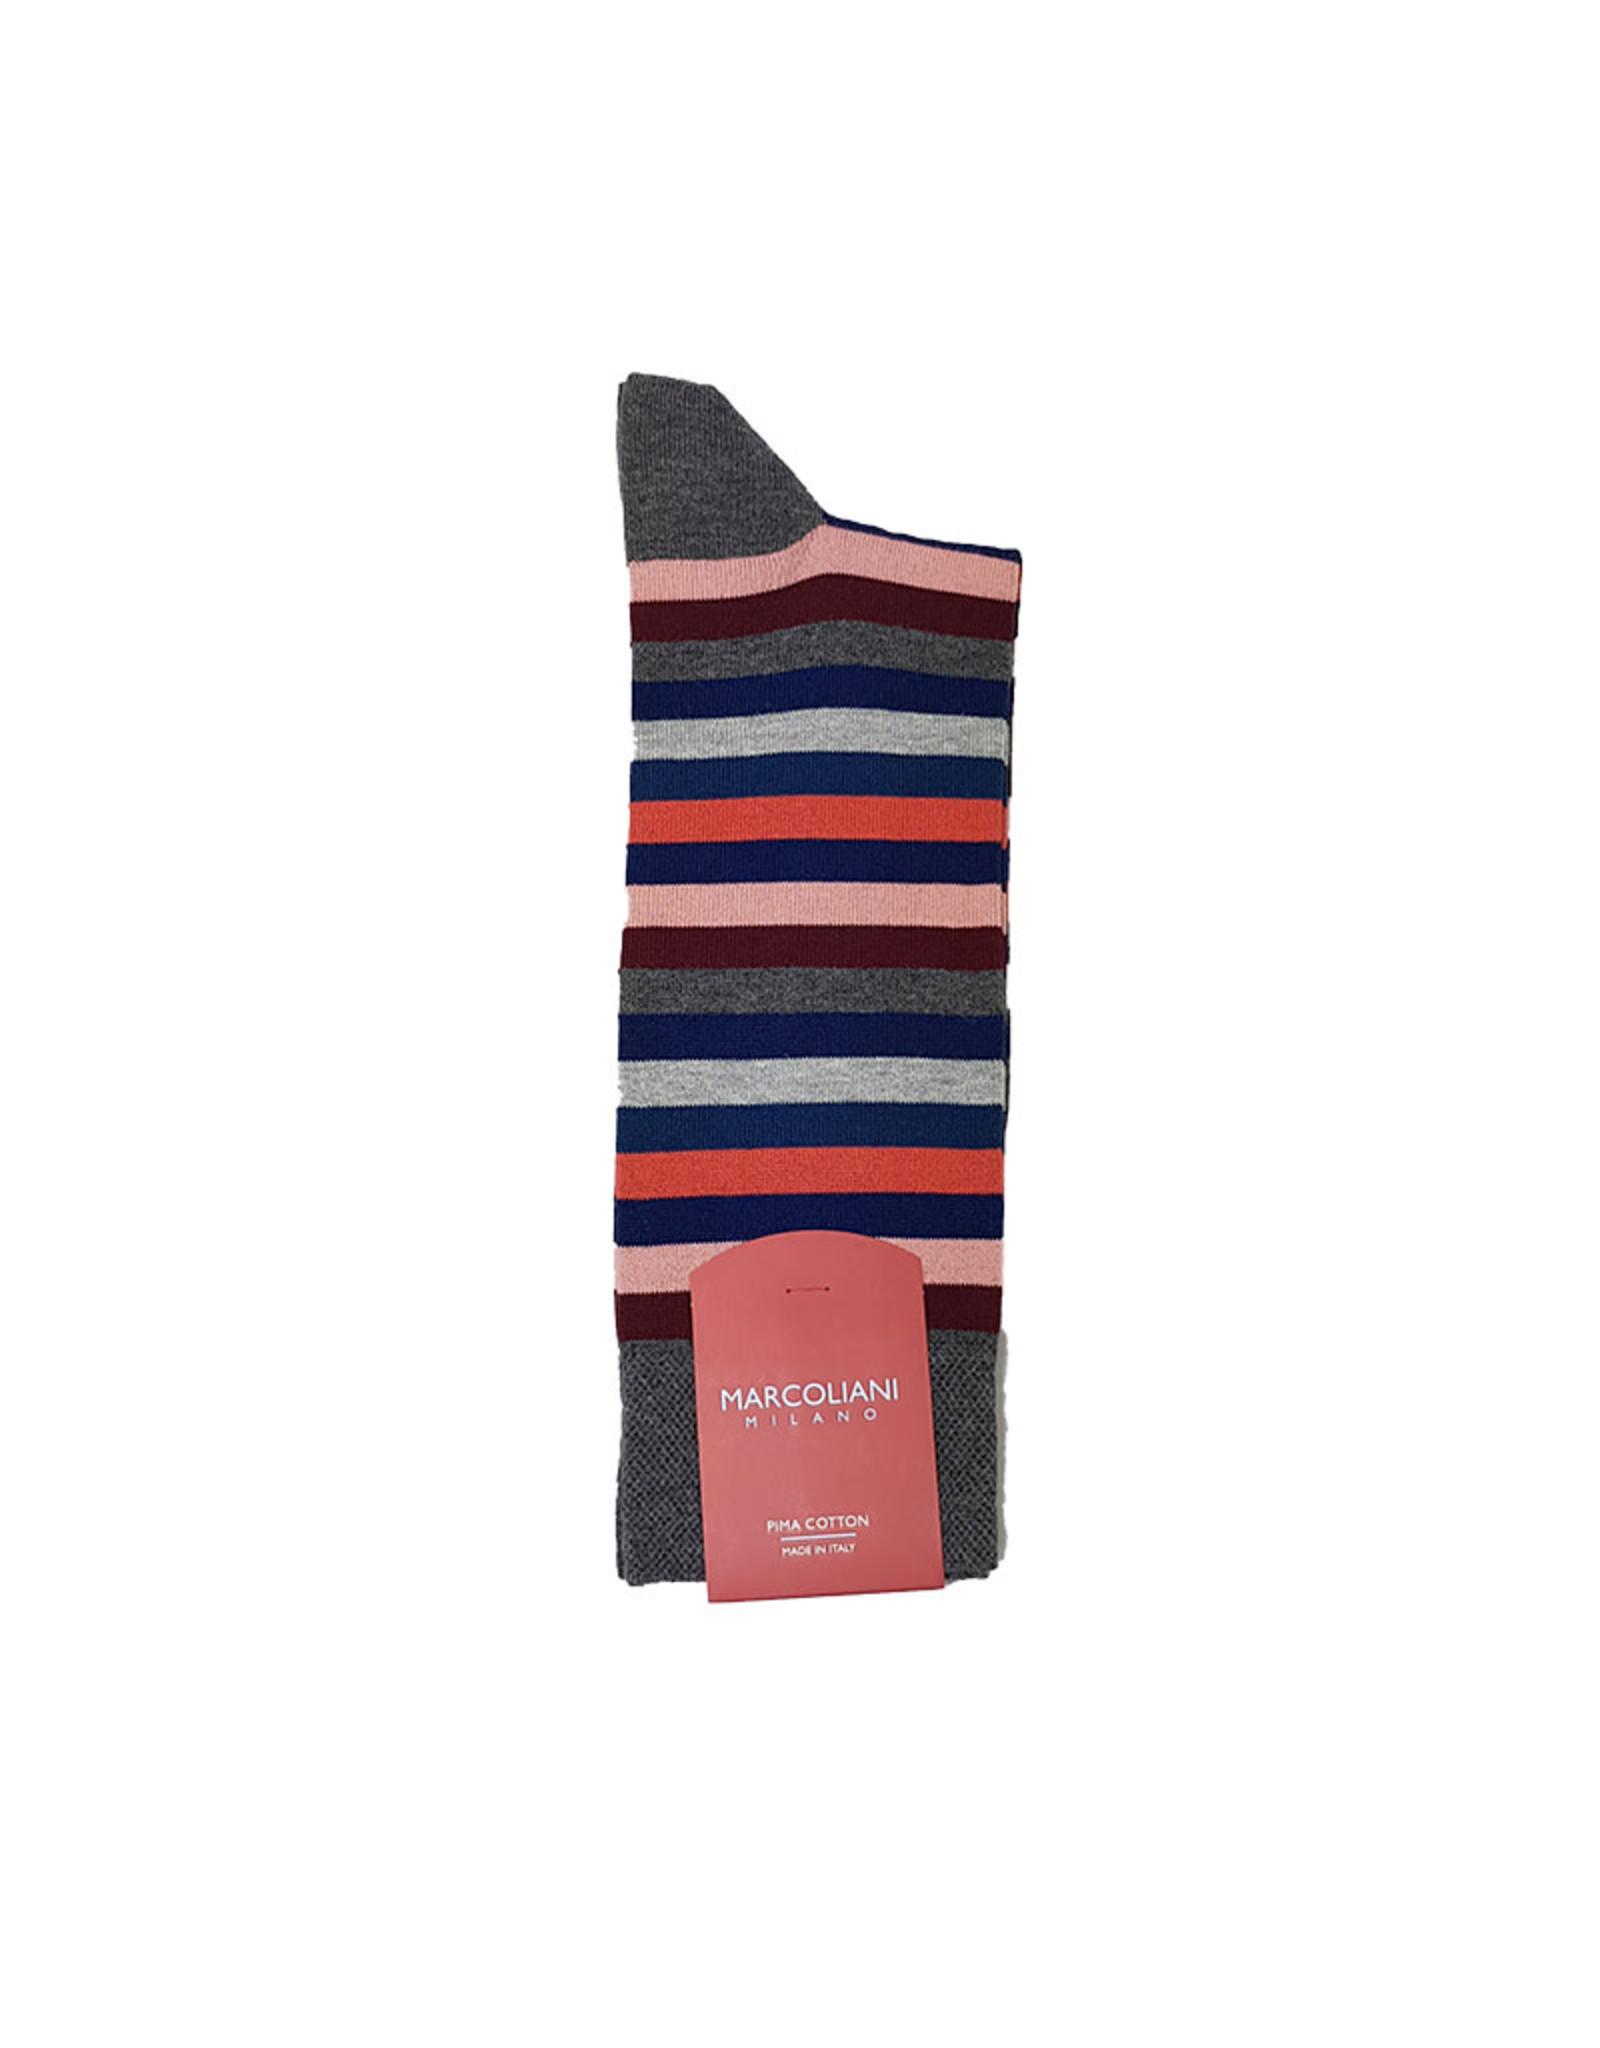 Marcoliani Marcoliani sokken rood gestreept 4040T/505